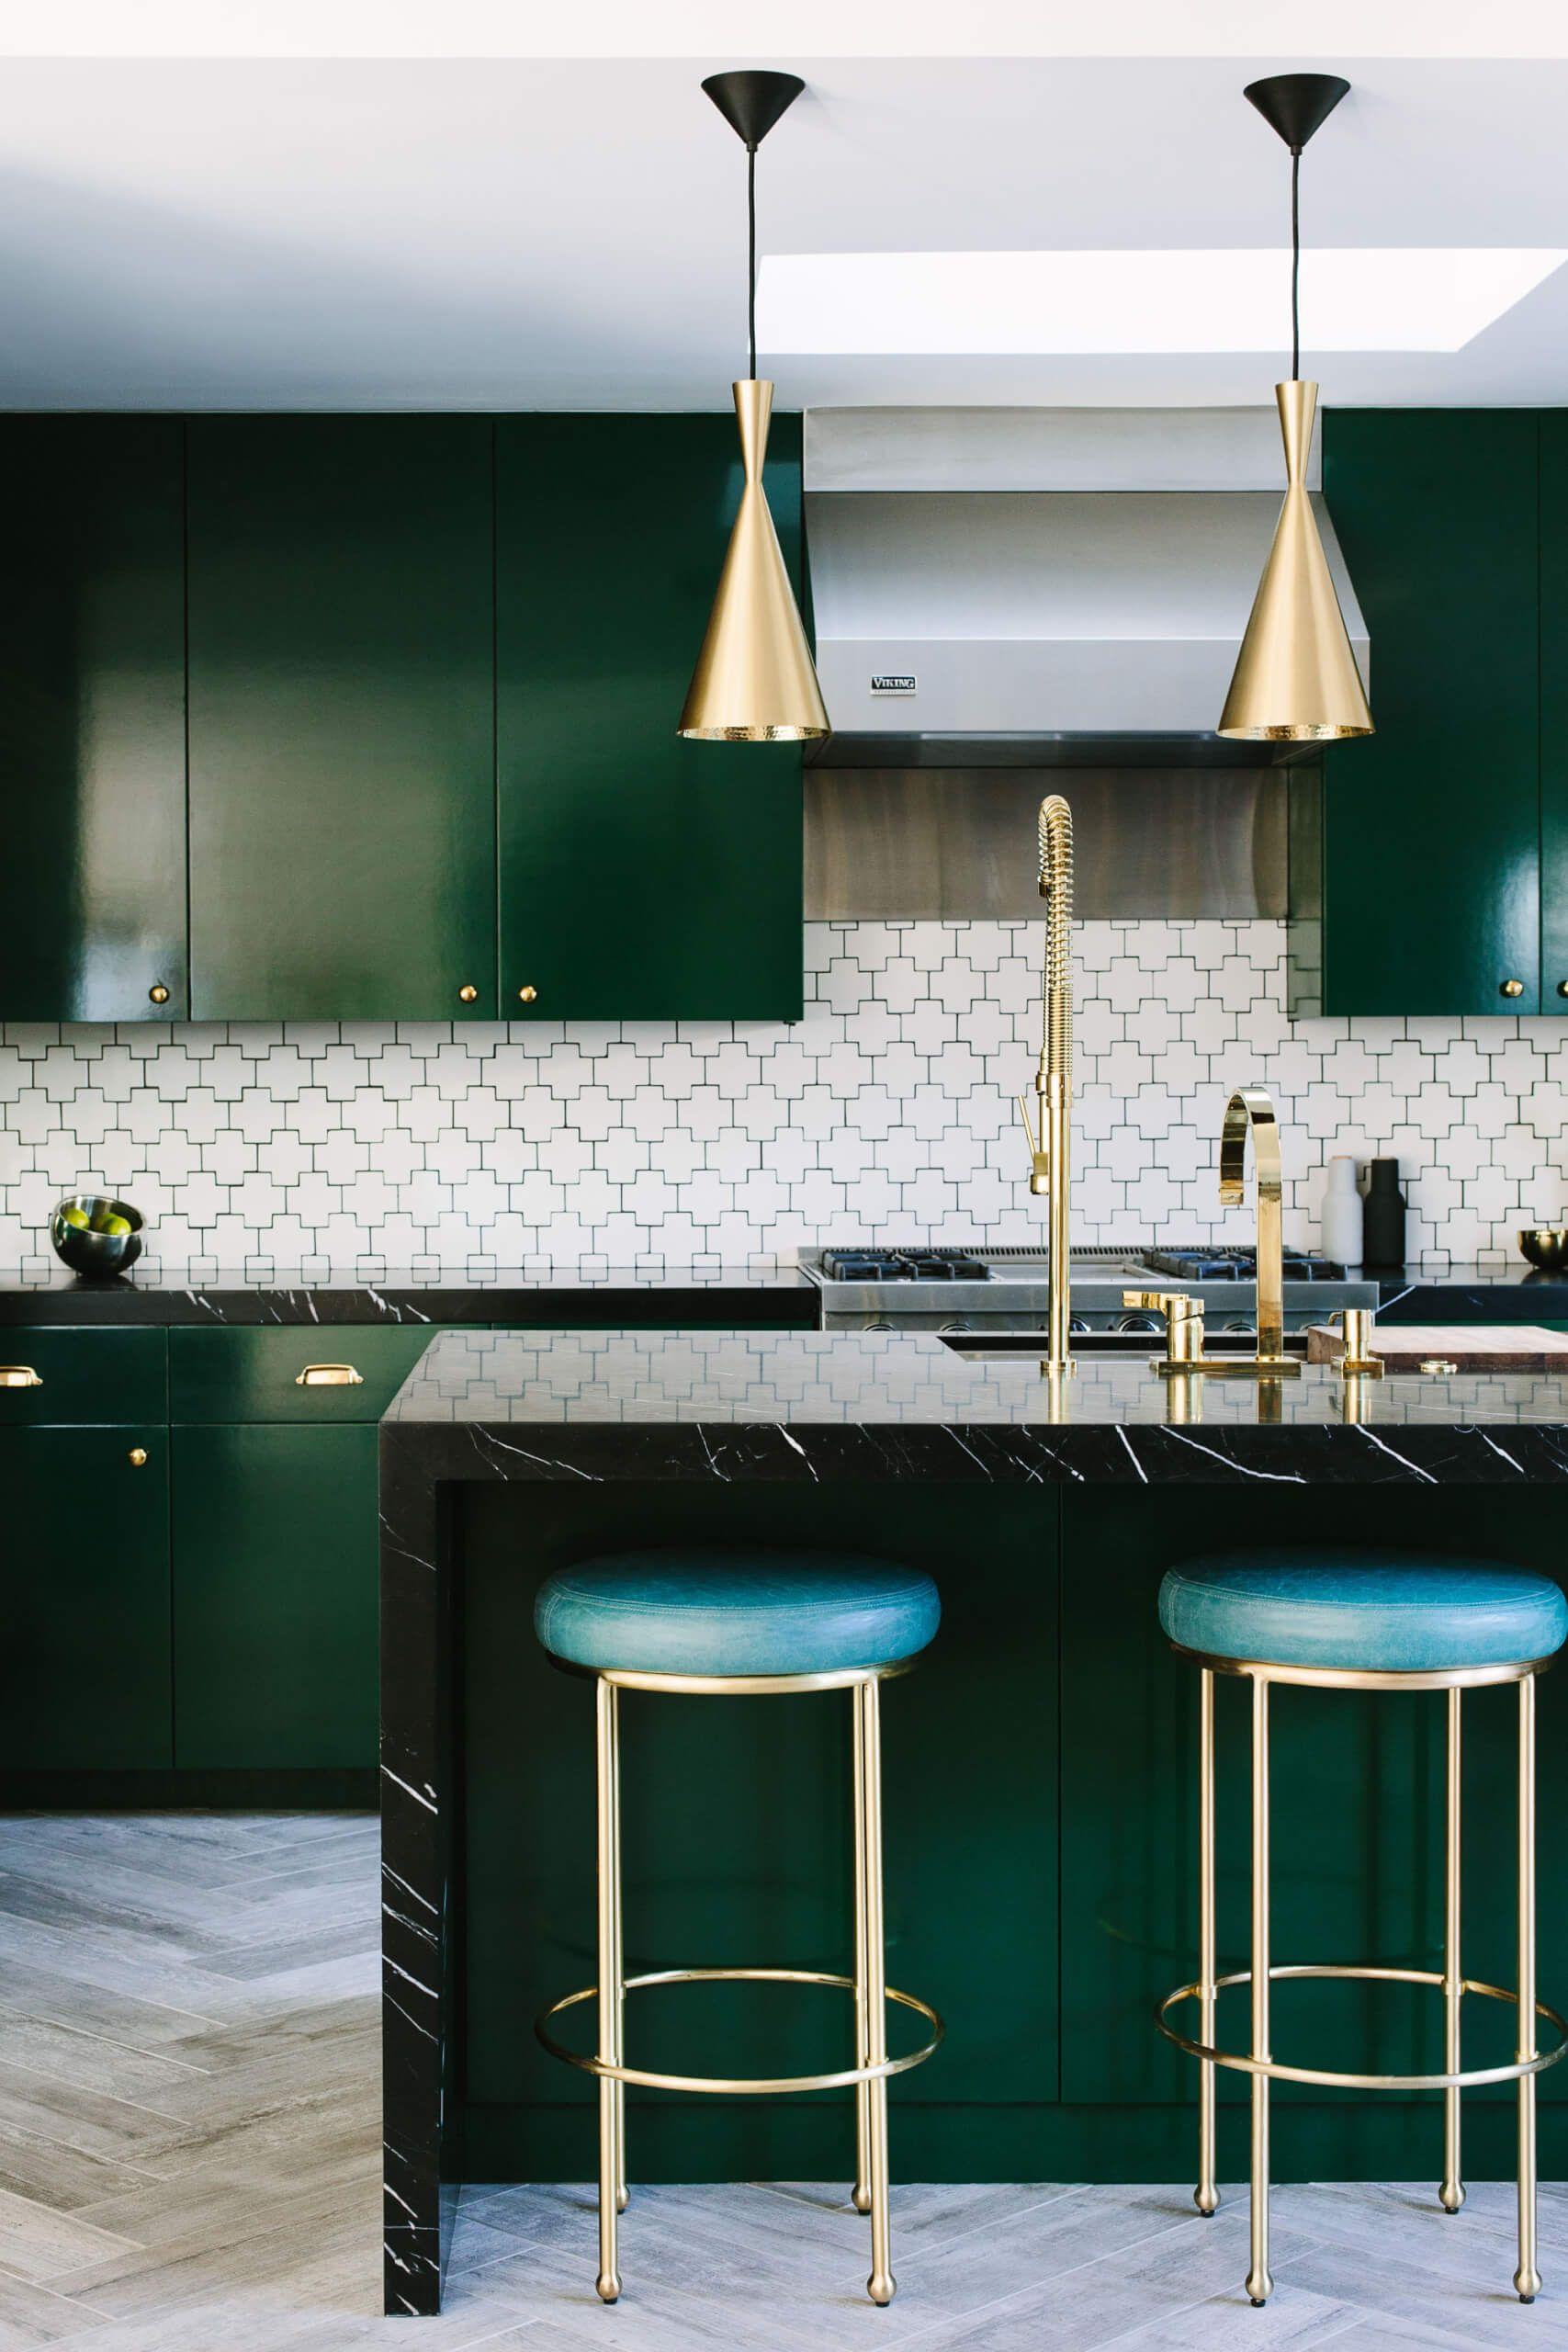 5 Statement Kitchens Making The Case For Color Nonagon Style Green Kitchen Cabinets Dark Green Kitchen Kitchen Trends